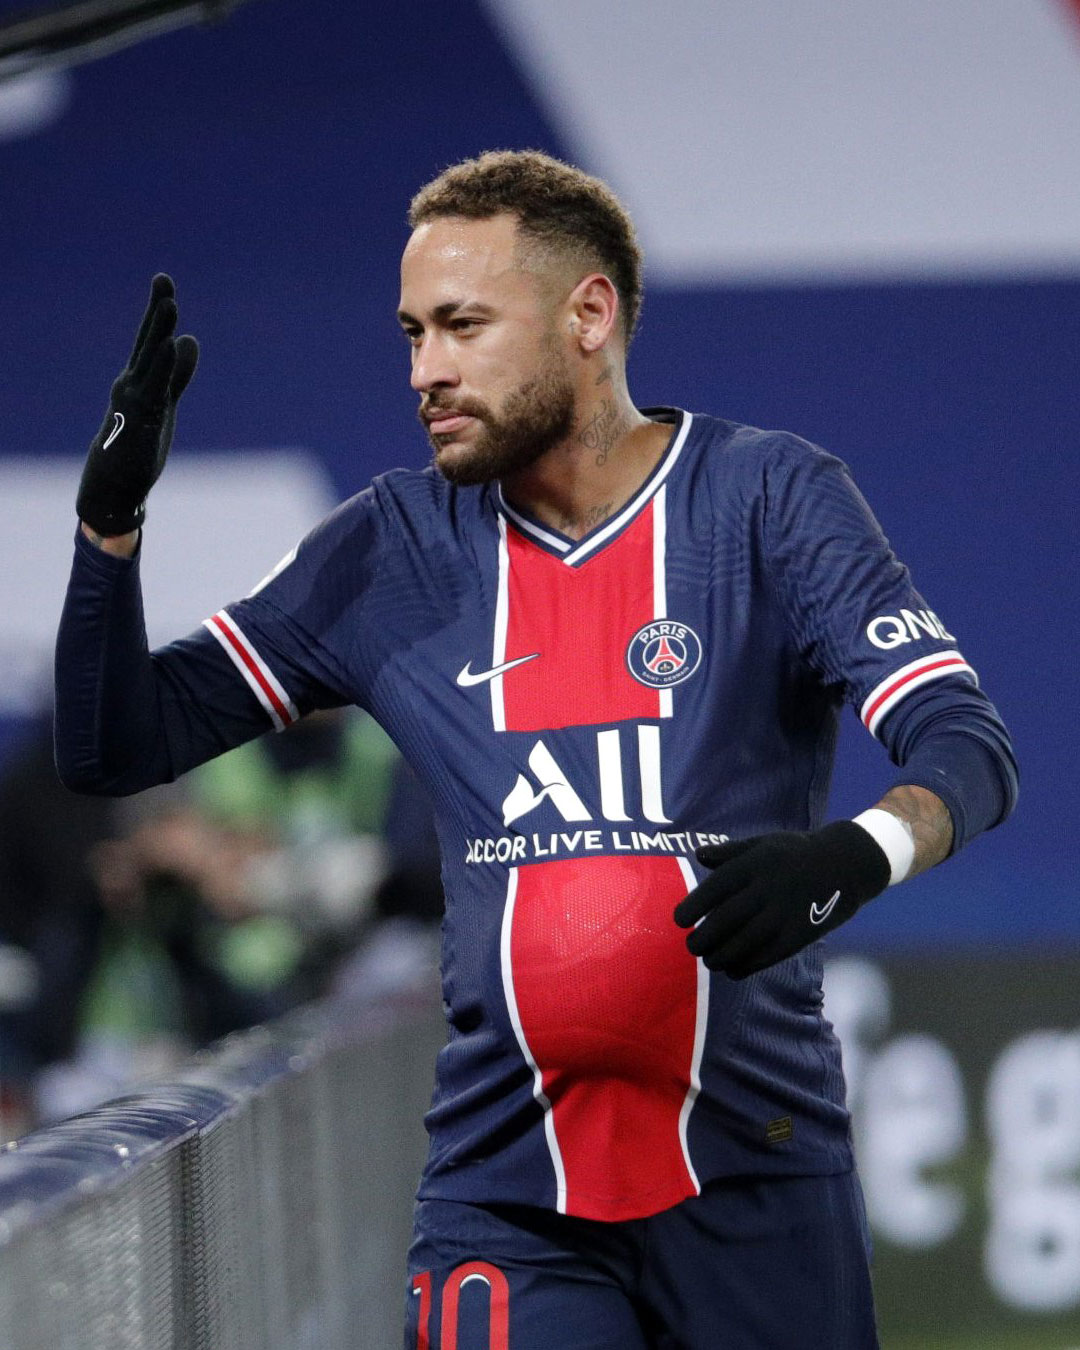 4. Neymar Jr., Paris Saint-Germain